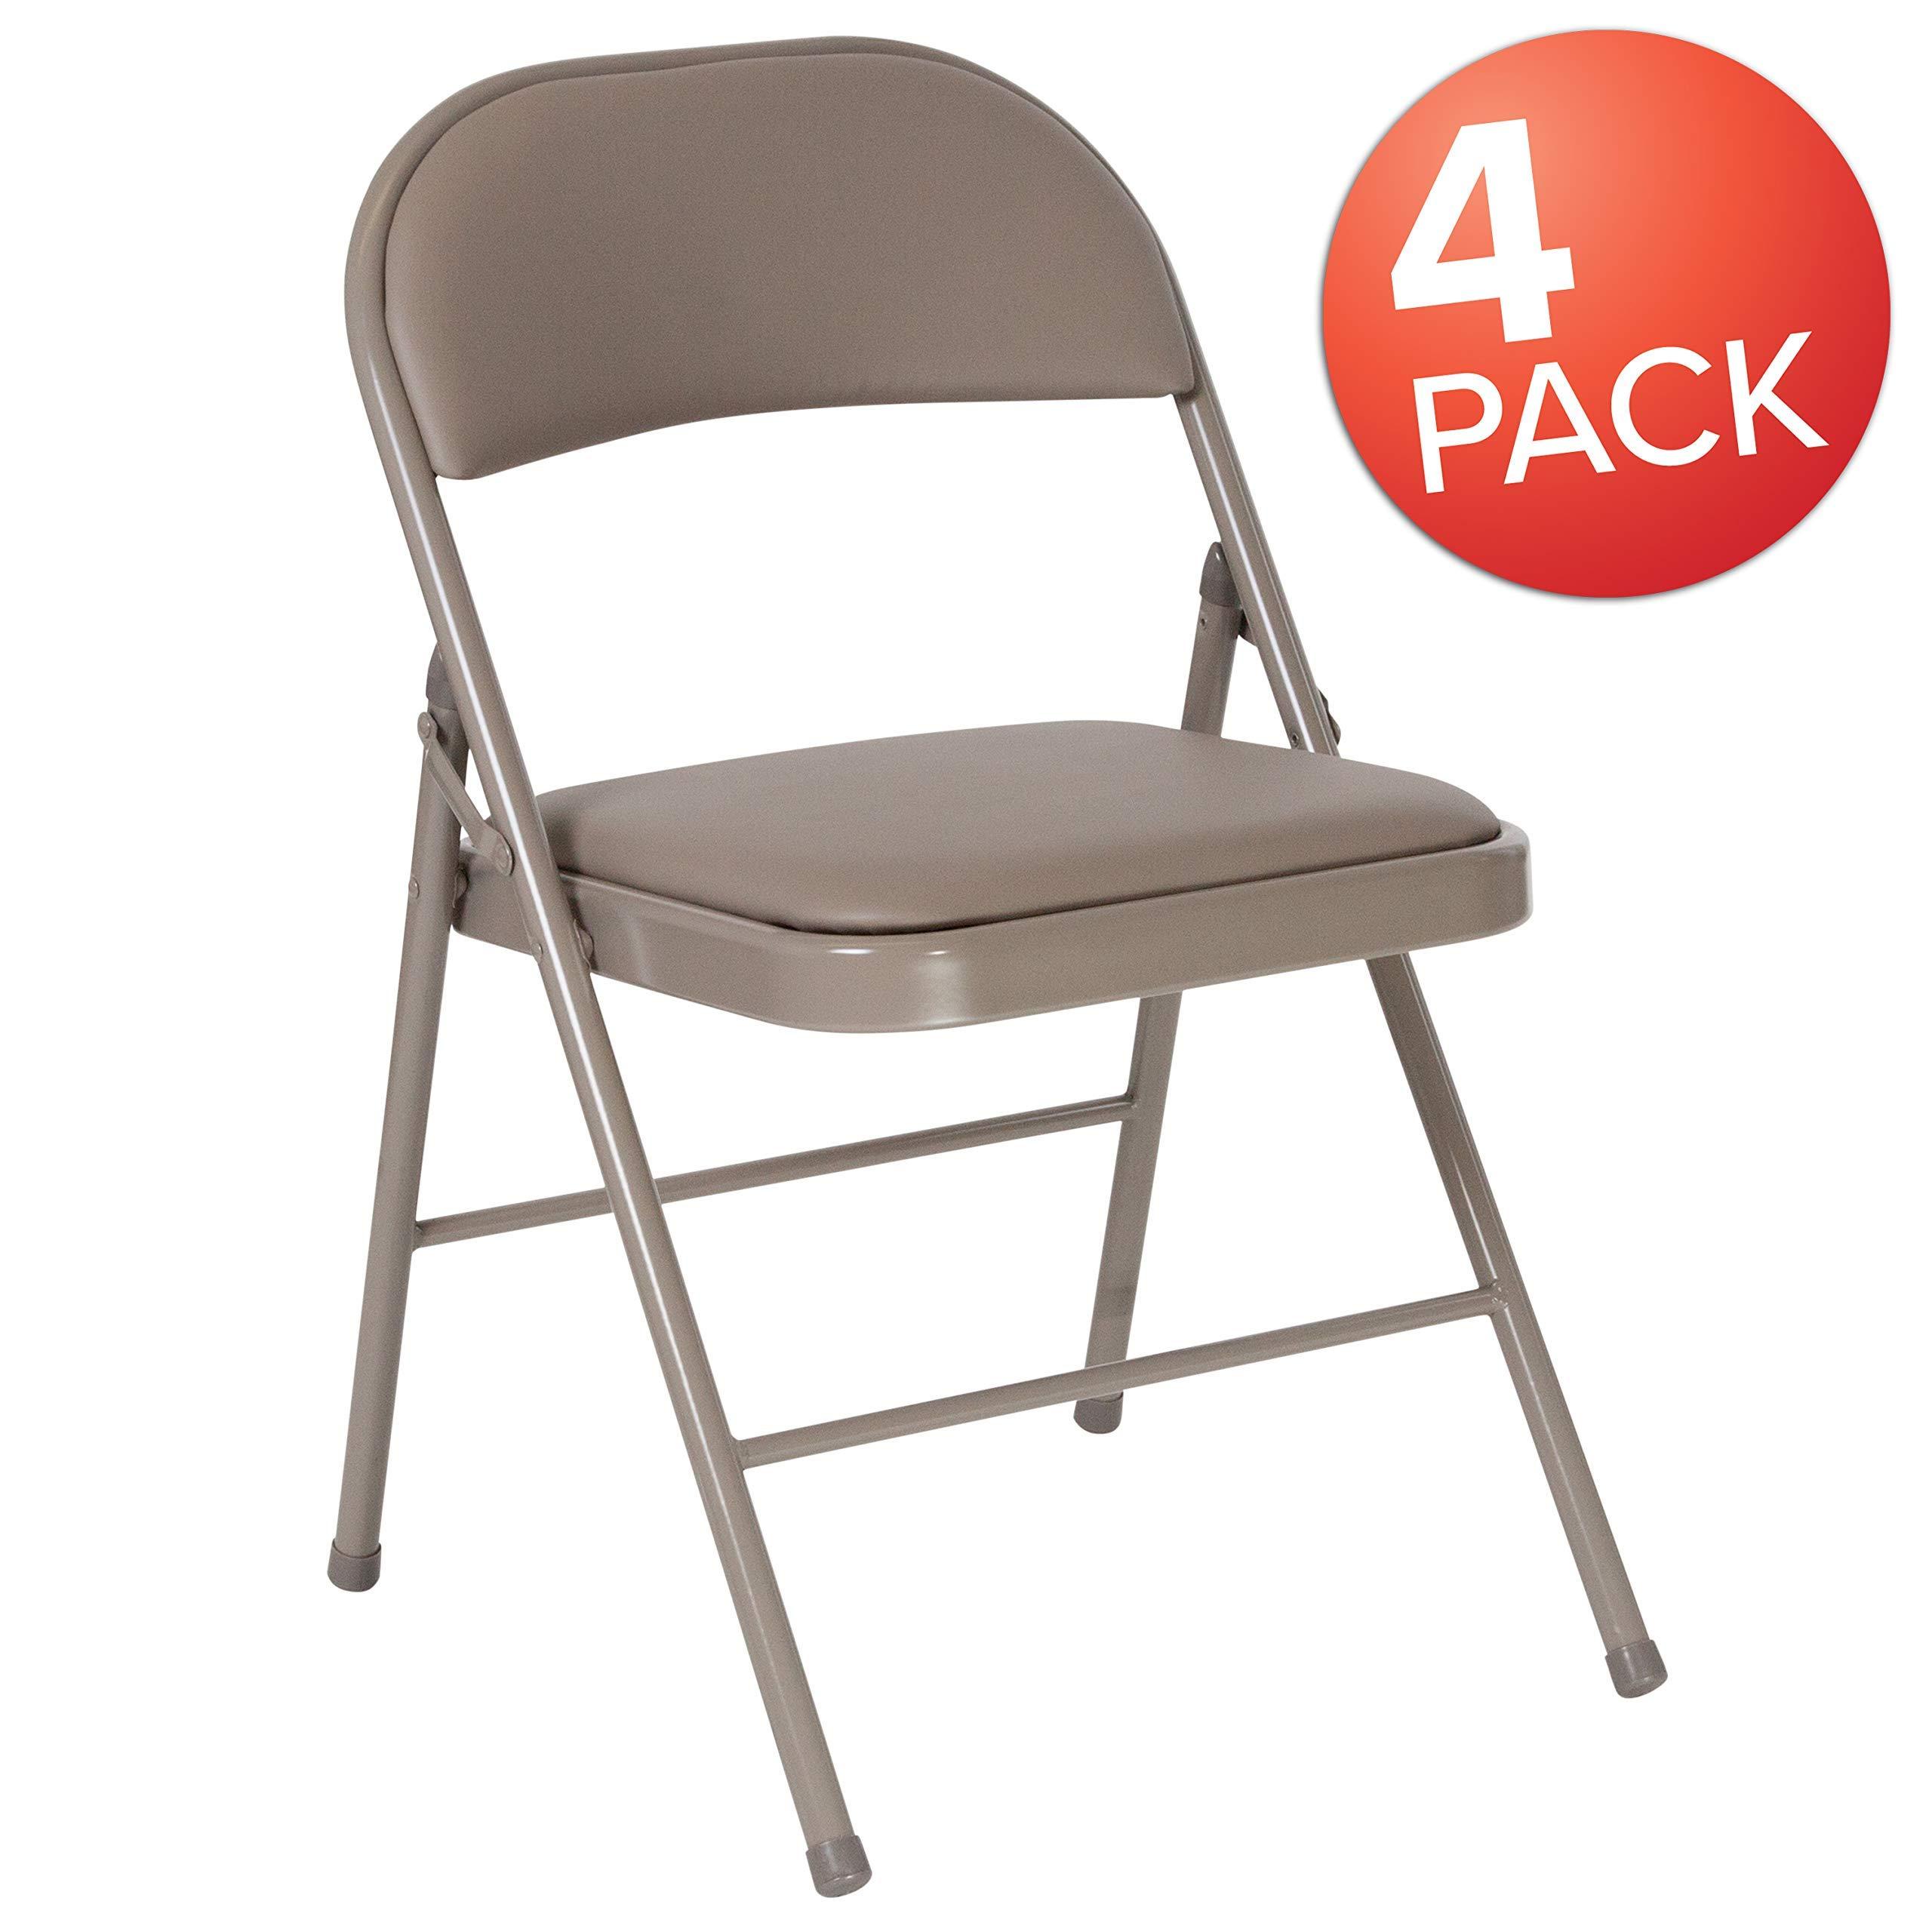 Flash Furniture 4 Pk. HERCULES Series Double Braced Gray Vinyl Folding Chair (Renewed) by Flash Furniture